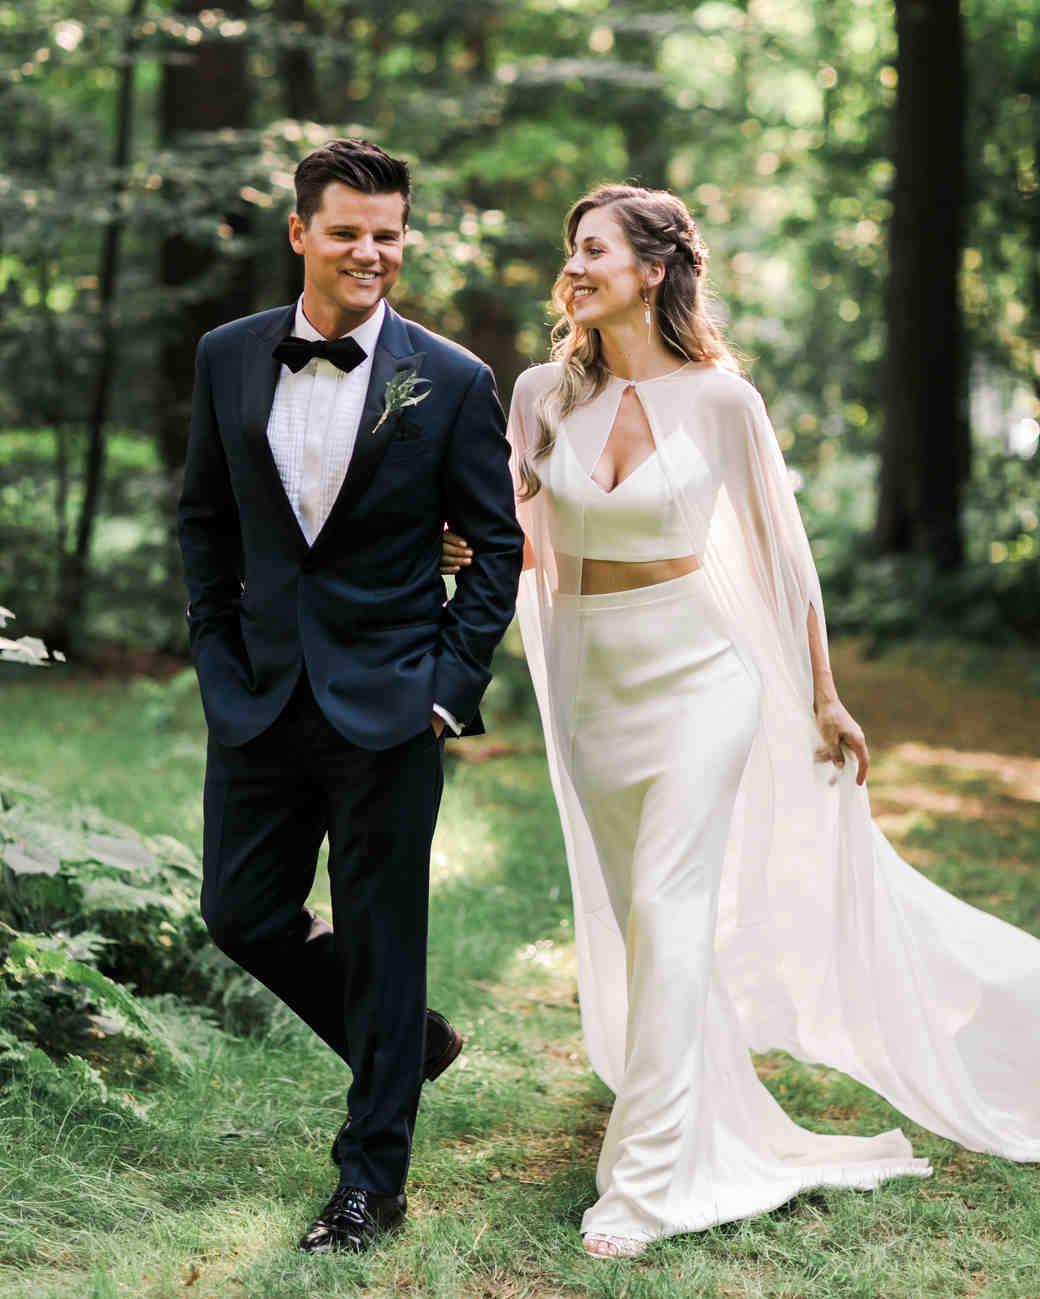 vanessa steven wedding couple walk stroll